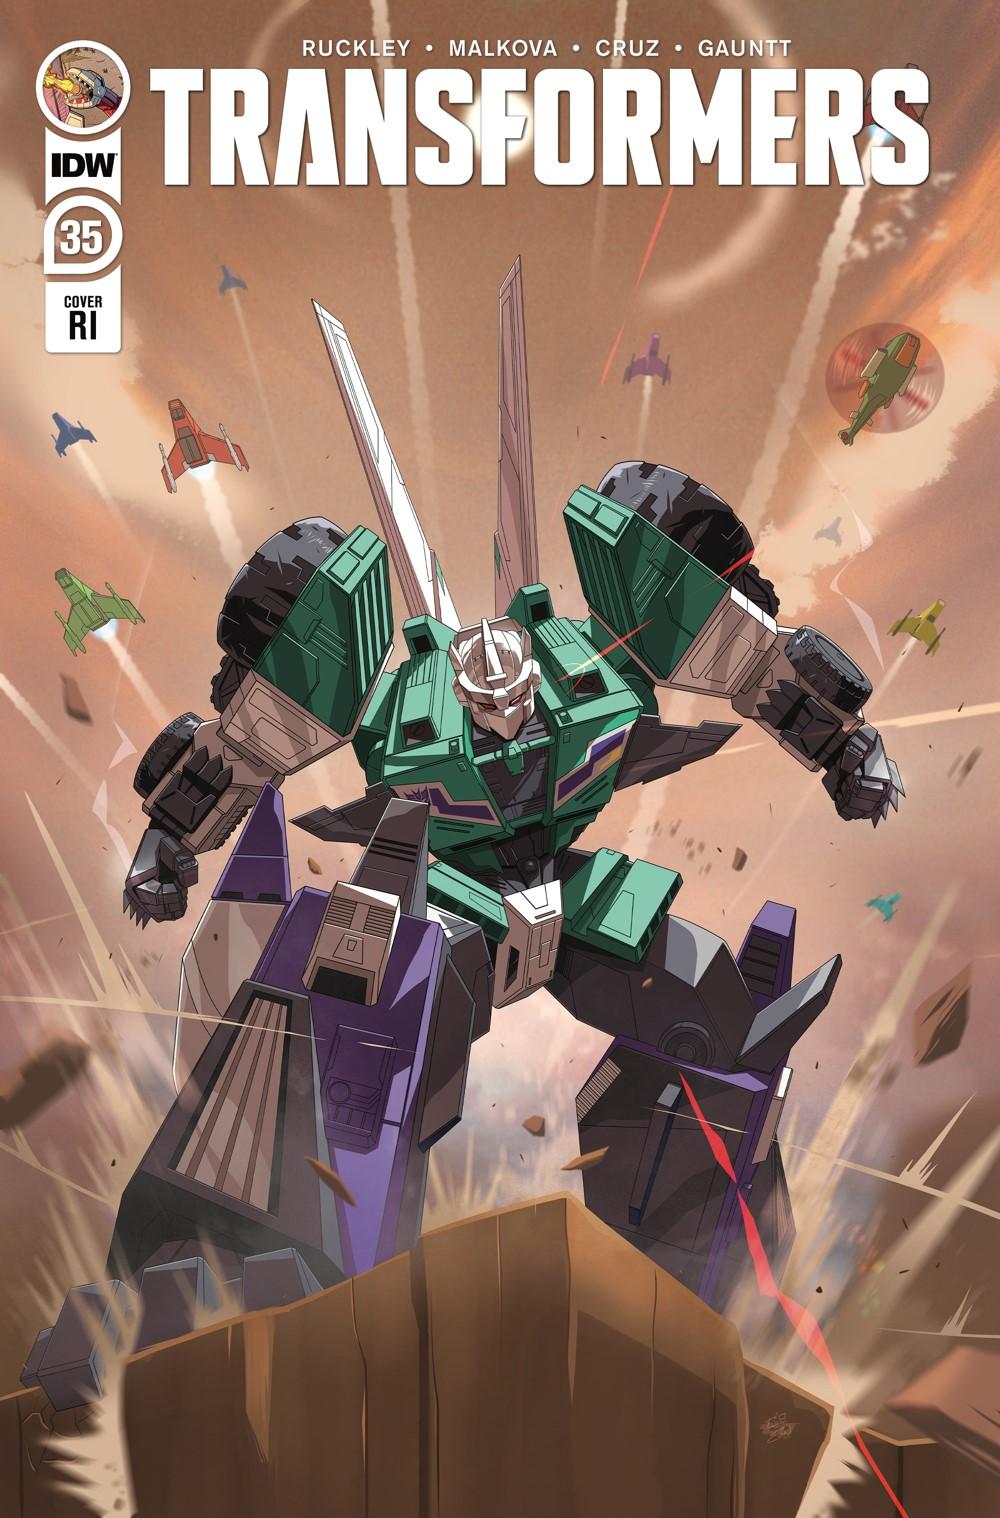 TF35-cvr-RI ComicList Previews: TRANSFORMERS #35